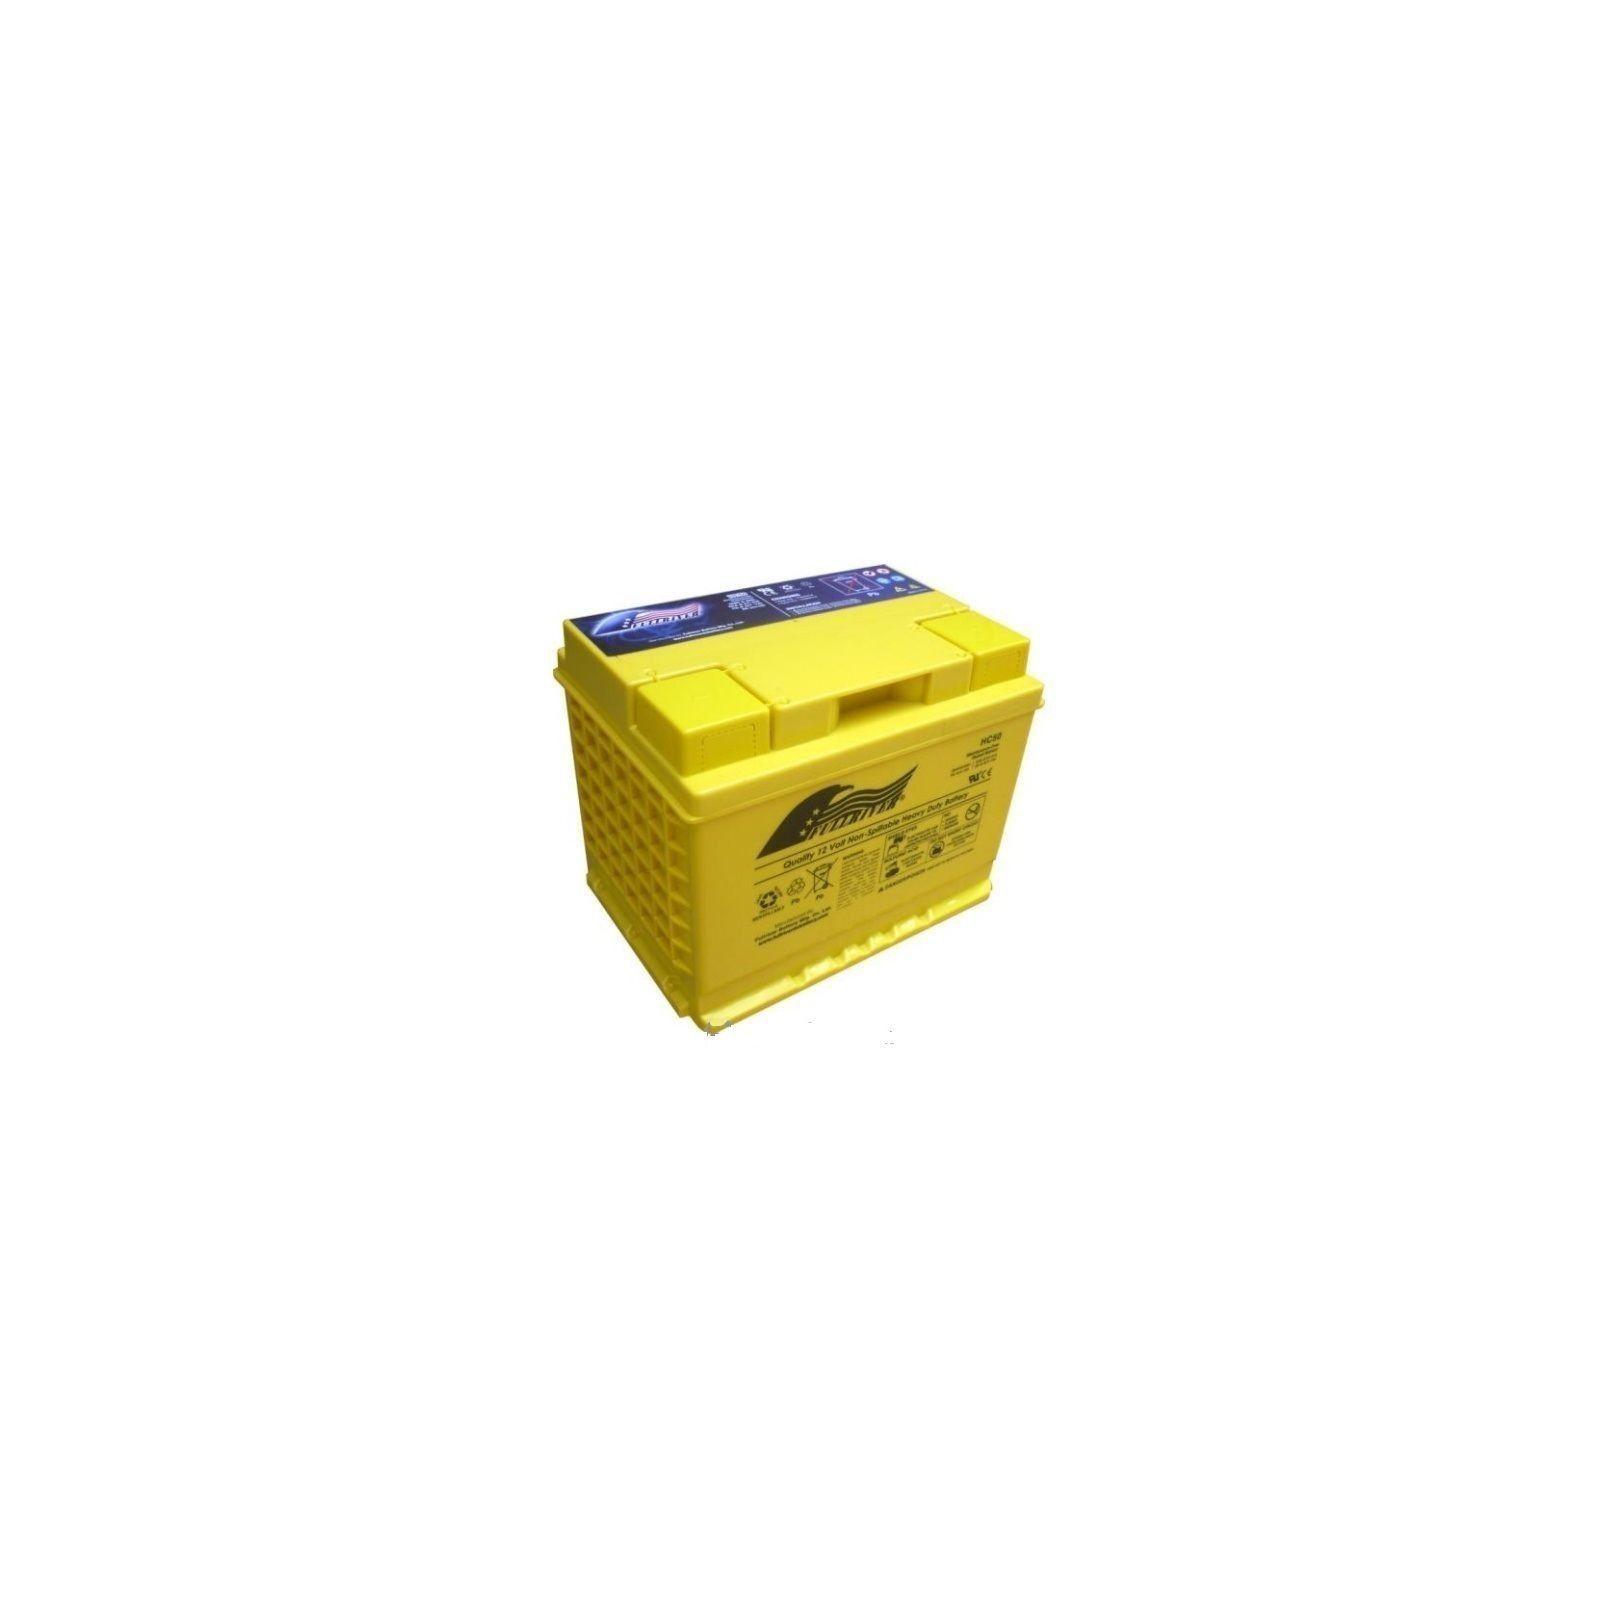 BATERIA Fullriver FULLRIVER HC50 50Ah 560A 12V FULLRIVER - 1